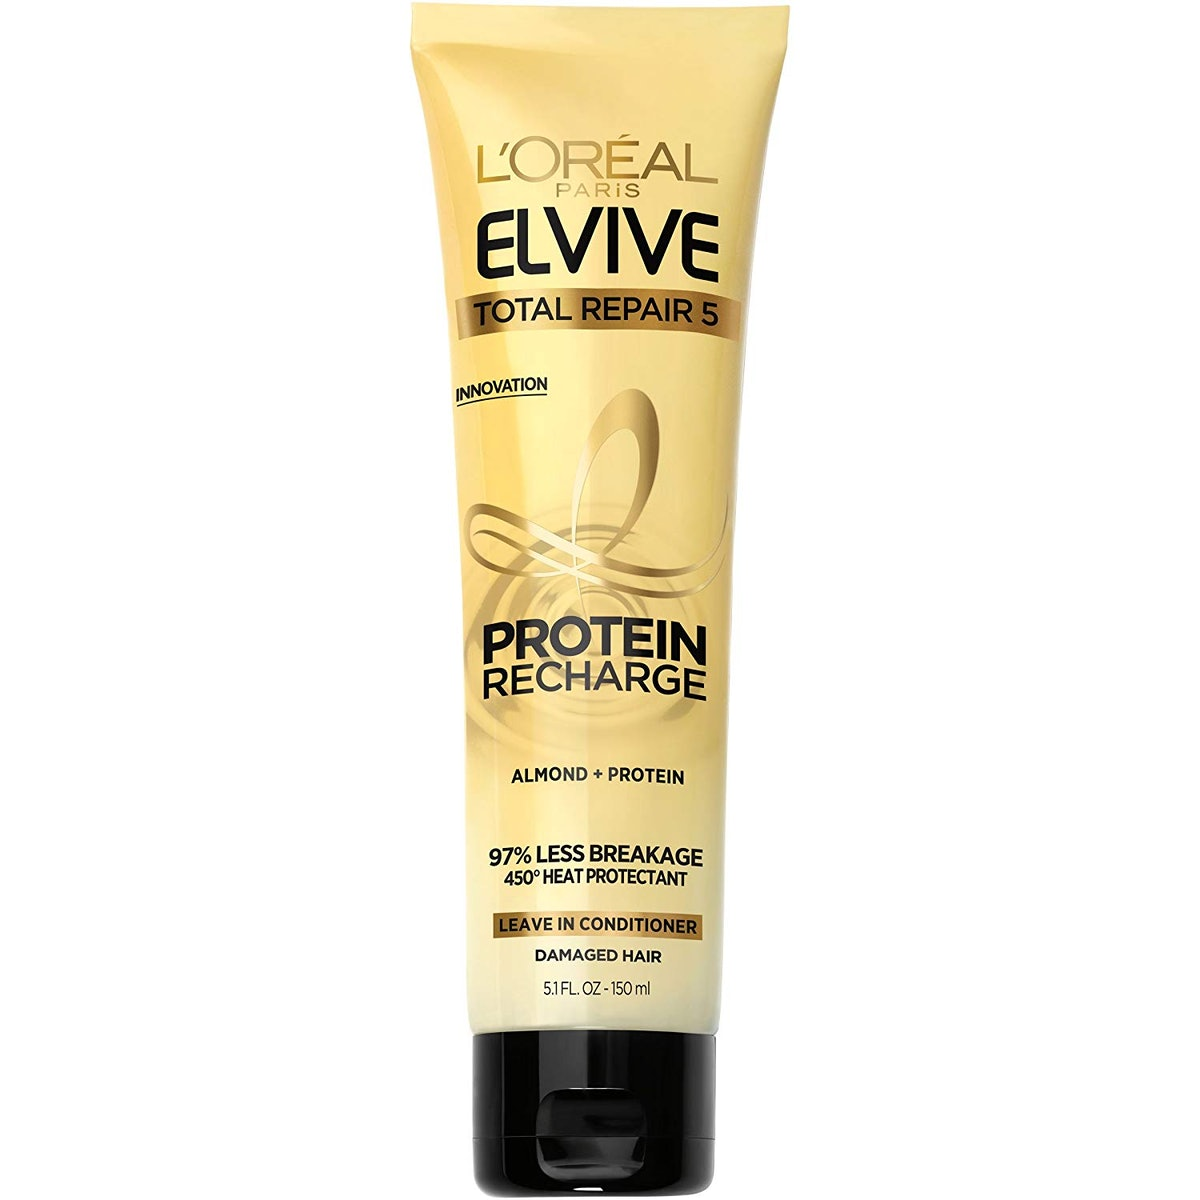 L'Oréal Paris Elvive Total Repair 5 Protein Recharge